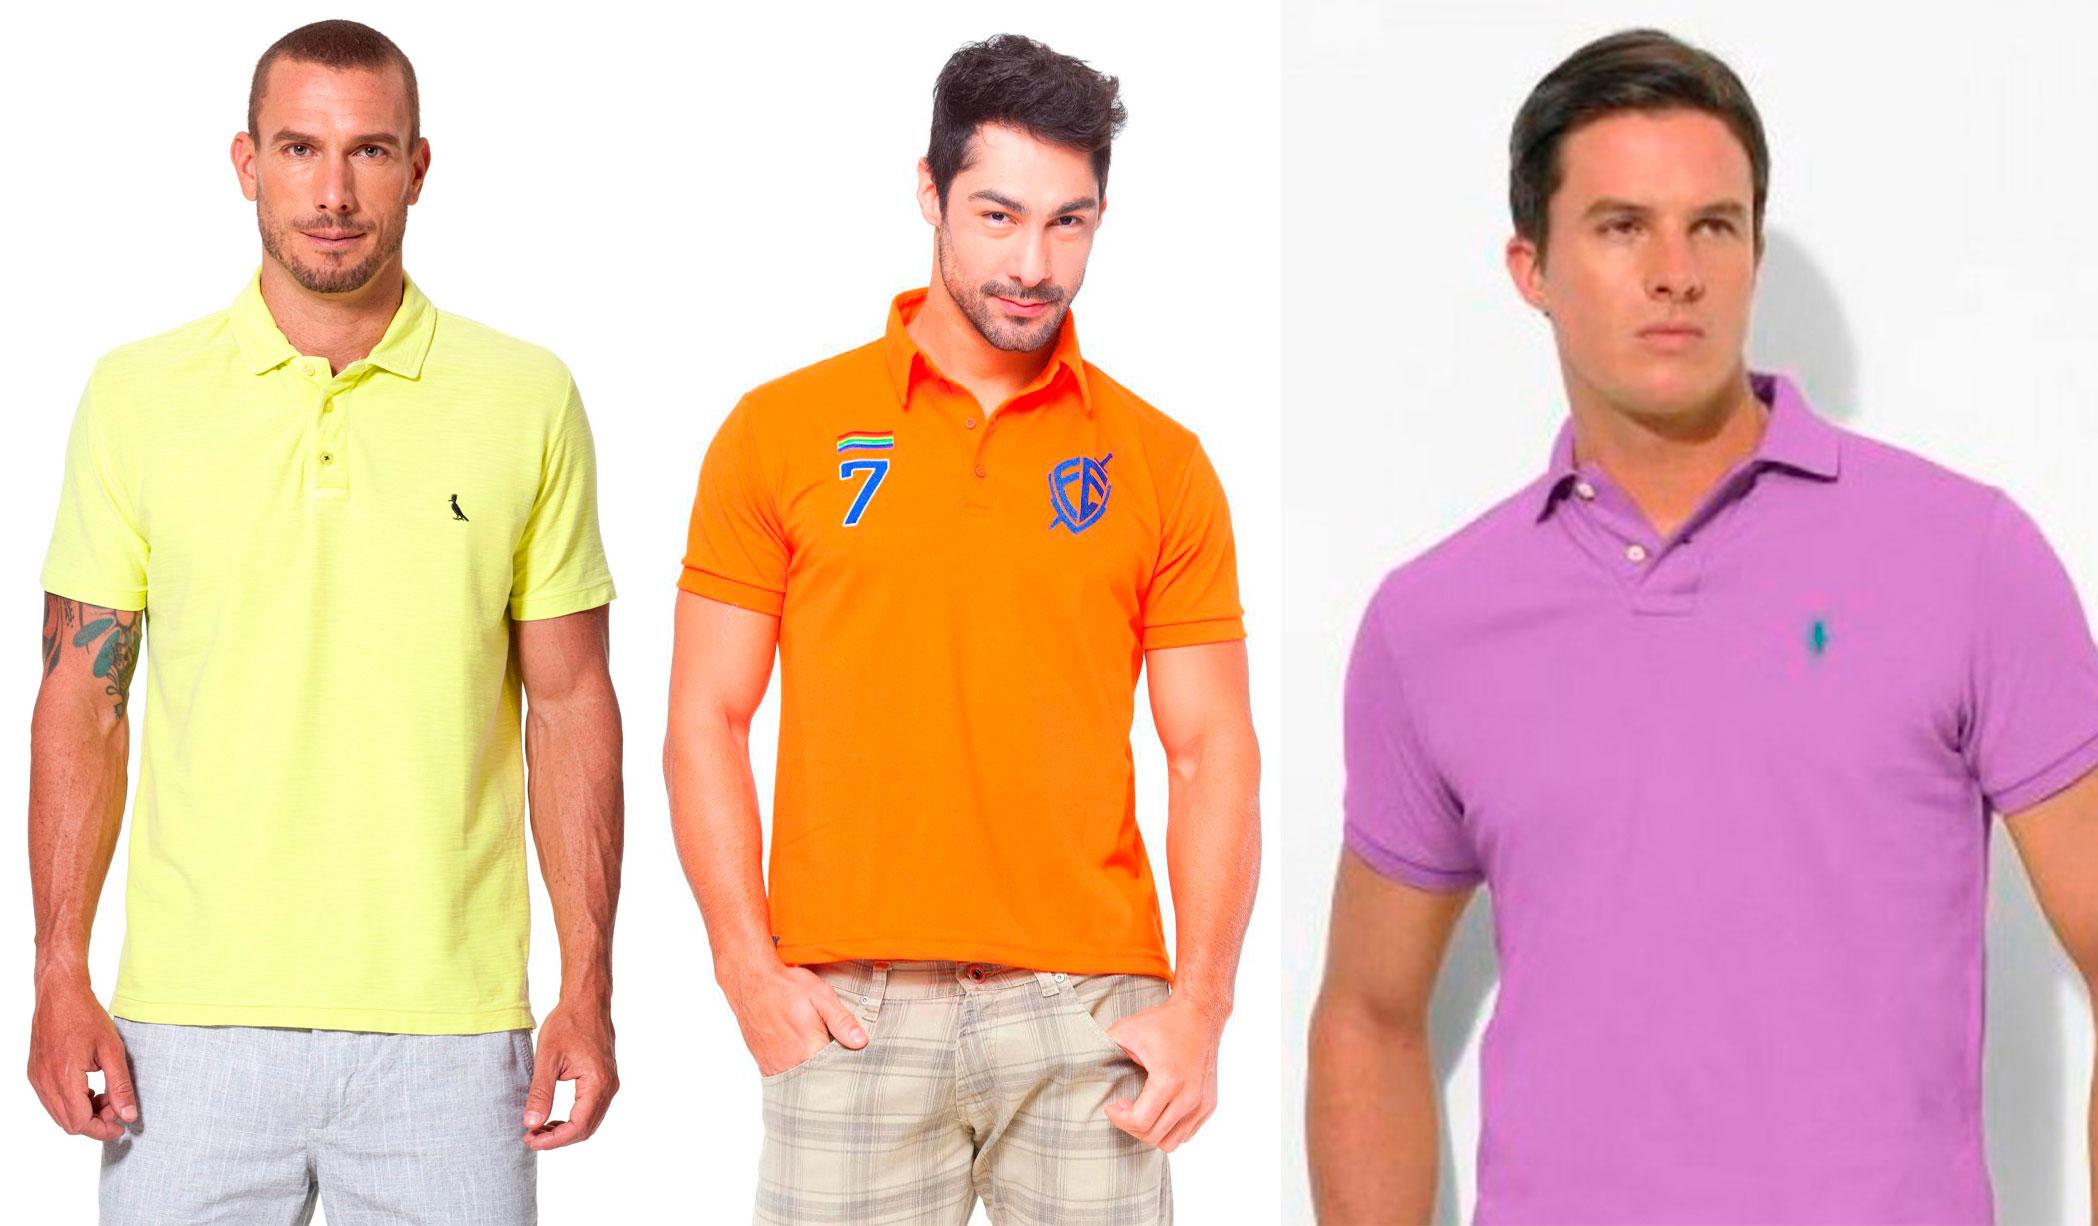 Tendência na moda masculina 2015  camisa Polo volta renovada – Pausa ... 1f1090ac45baa